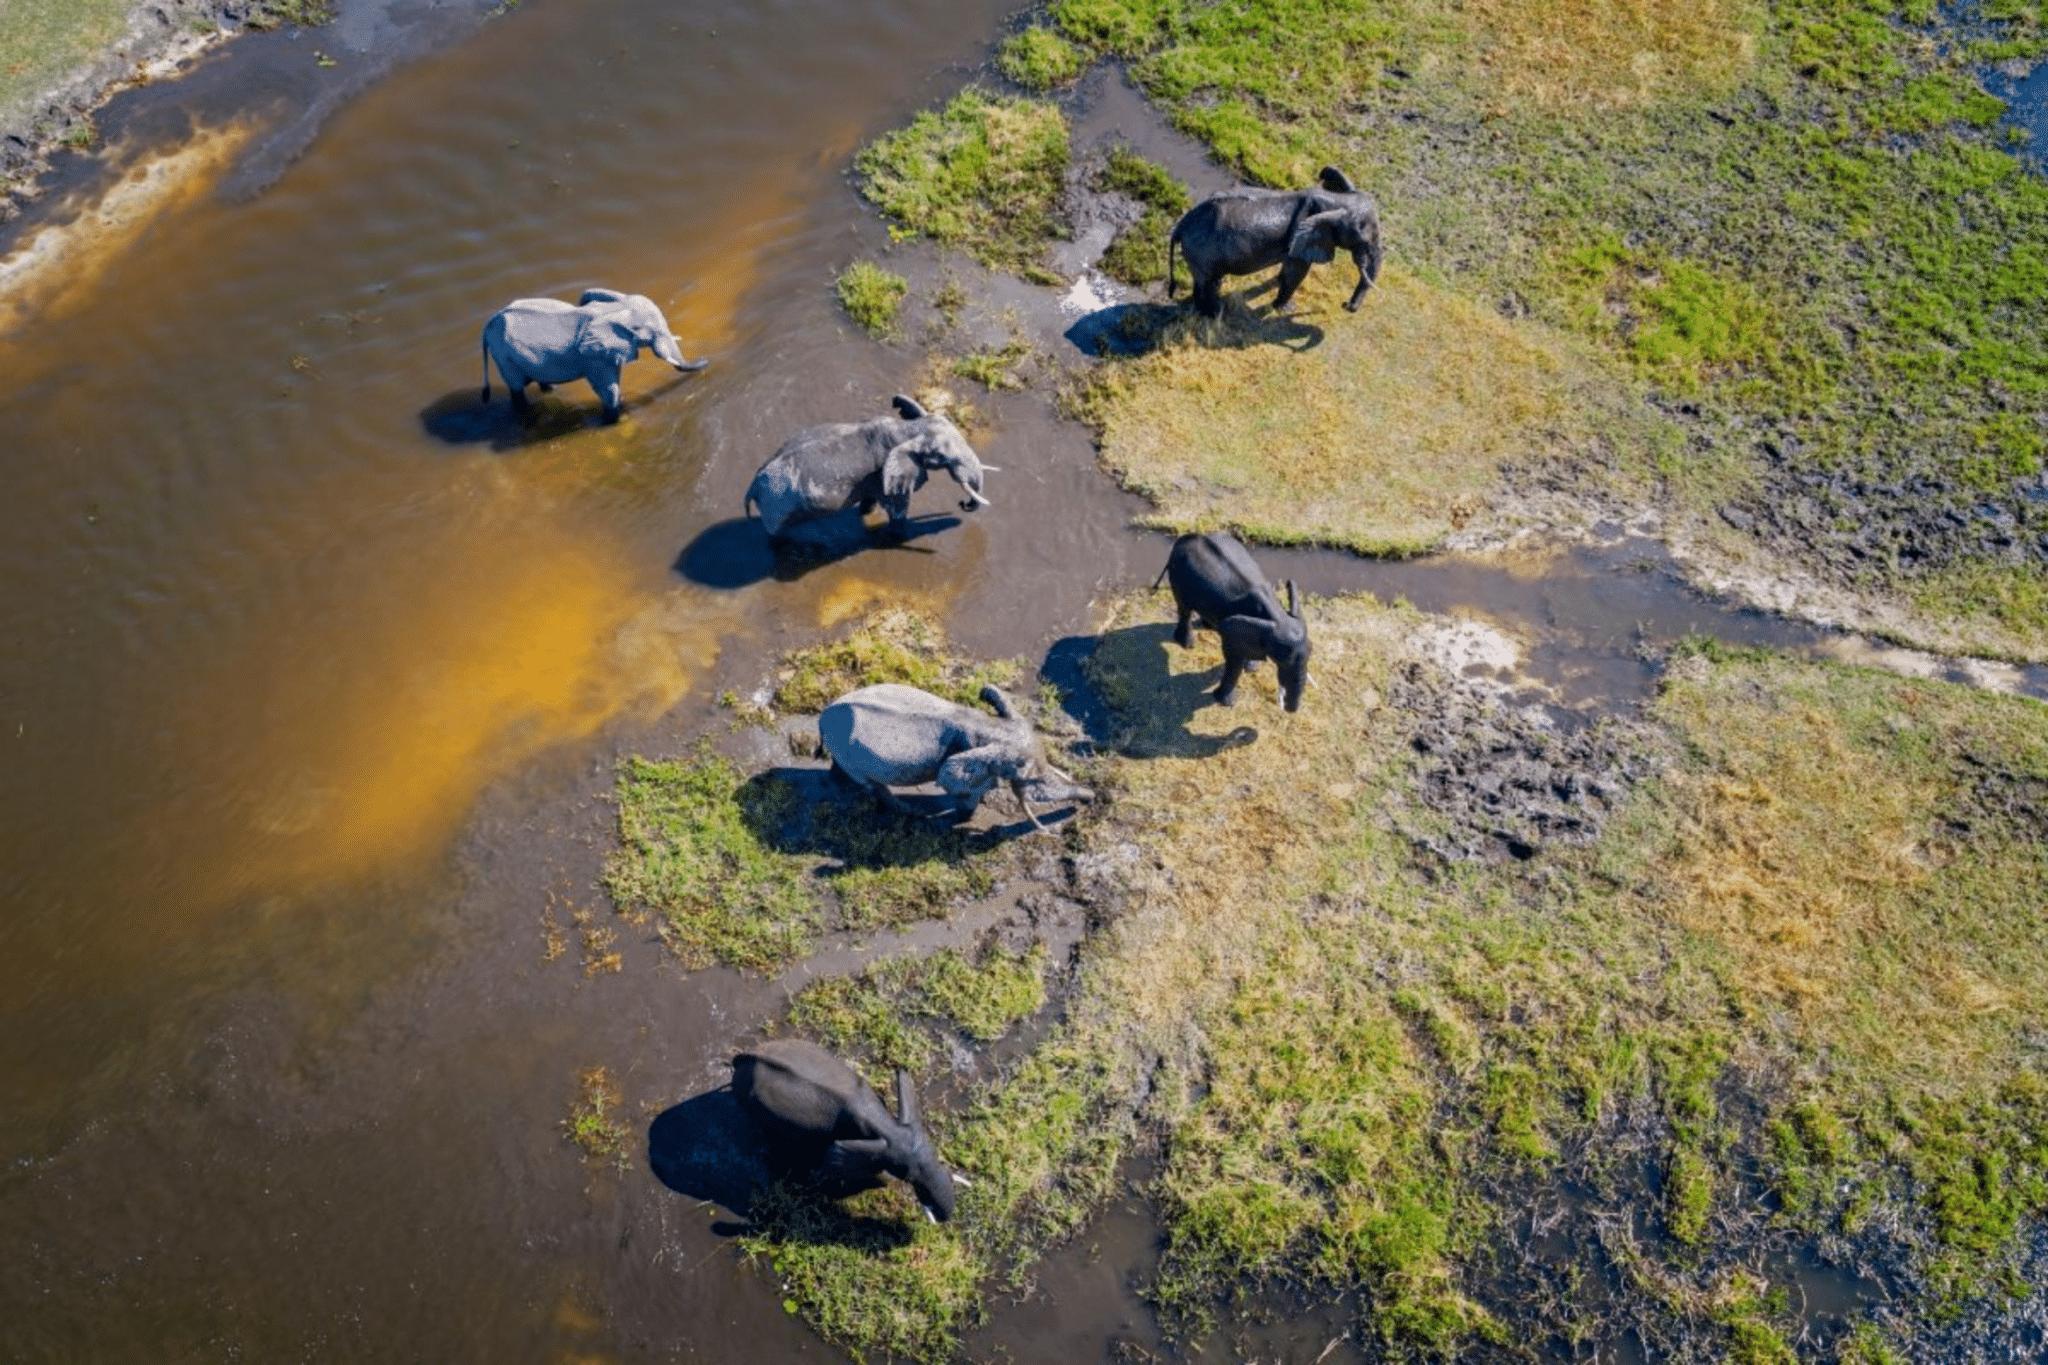 ReconAfrica, pozzi petroliferi, Namibia, Botswana, Kavango, licenze, elefanti, catastrofe ambientale, alghe tossiche, riscaldamento globale, ecosistema, comunità locali, IEA, zero emissioni, petrolio, Energy Close-up Egineering.